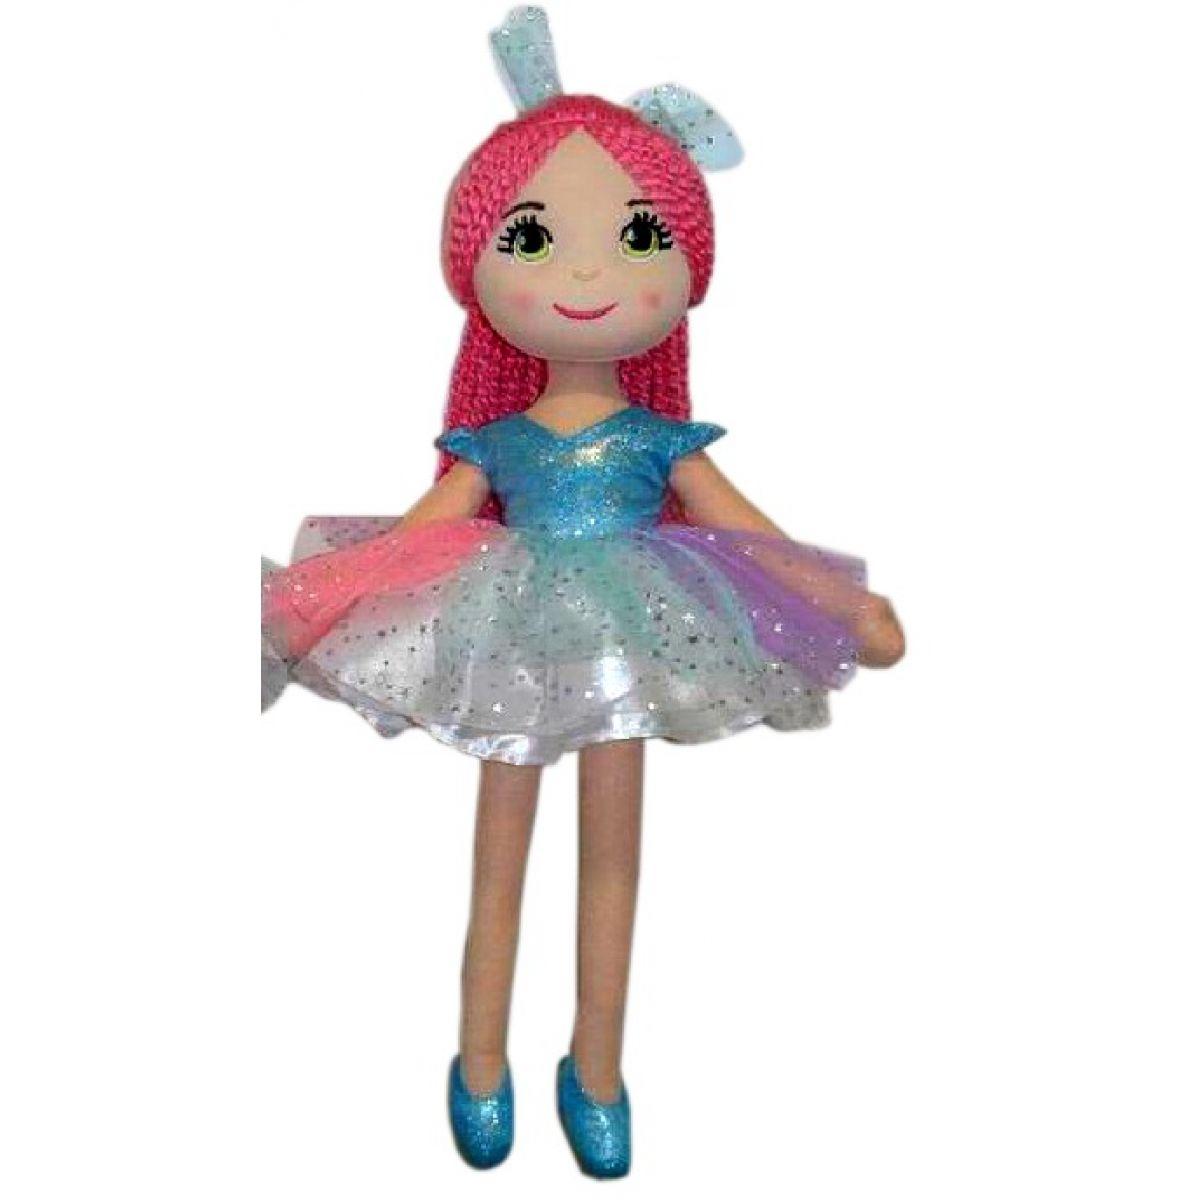 Купить Кукла Abtoys балерина в голубой пачке 40 см, Китай, Куклы и пупсы